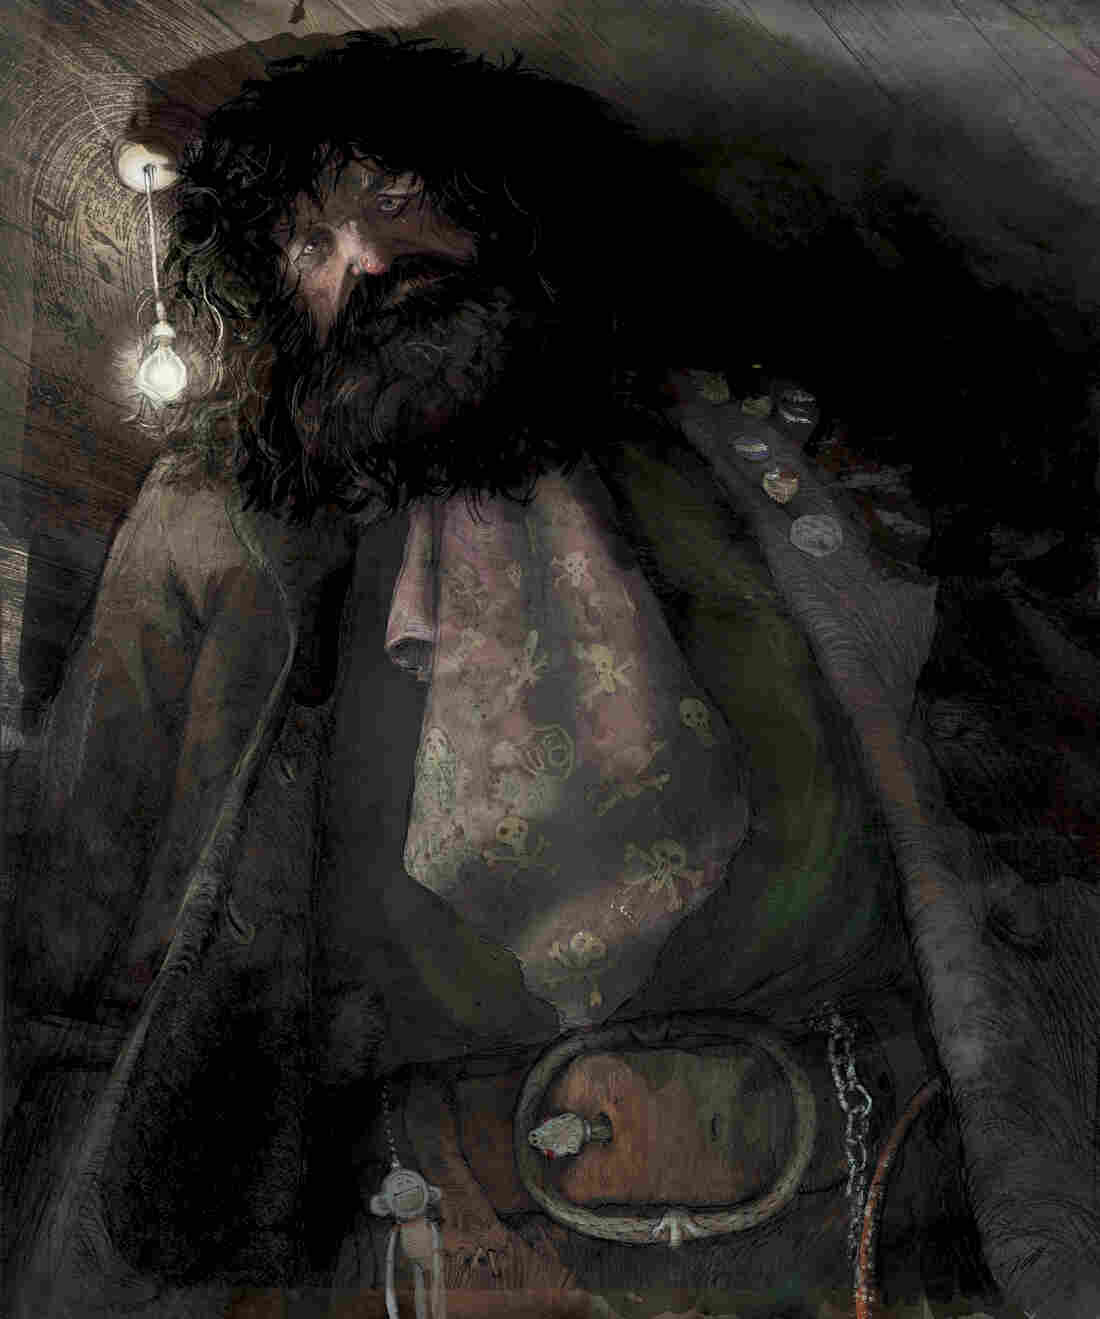 Hagrid, the trusty half-giant himself.